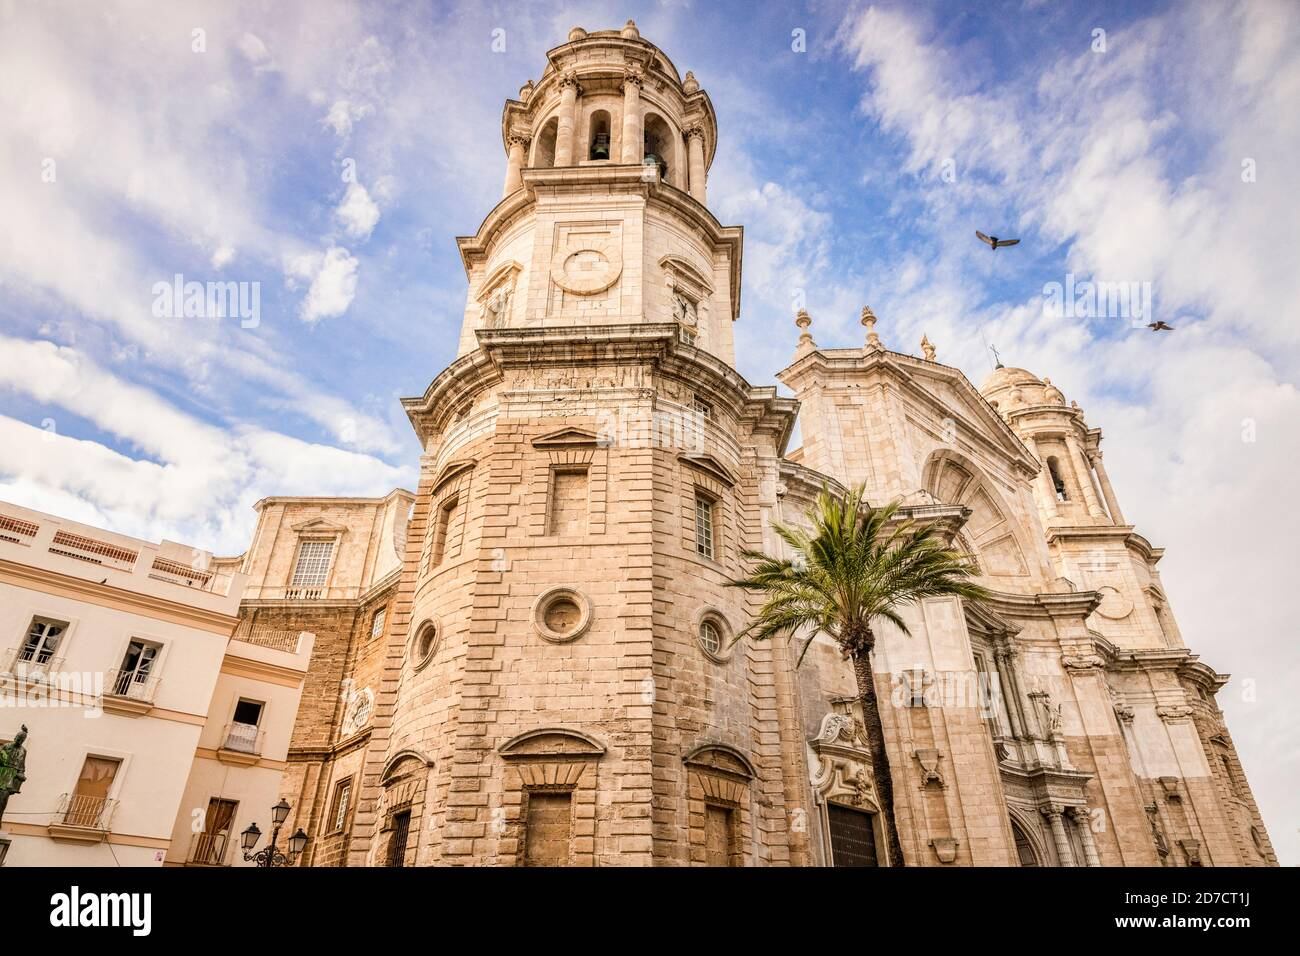 12 de marzo de 2020: Cádiz, España - la fachada norte de la Catedral de Santa Cruz, Catedral de Cádiz Foto de stock